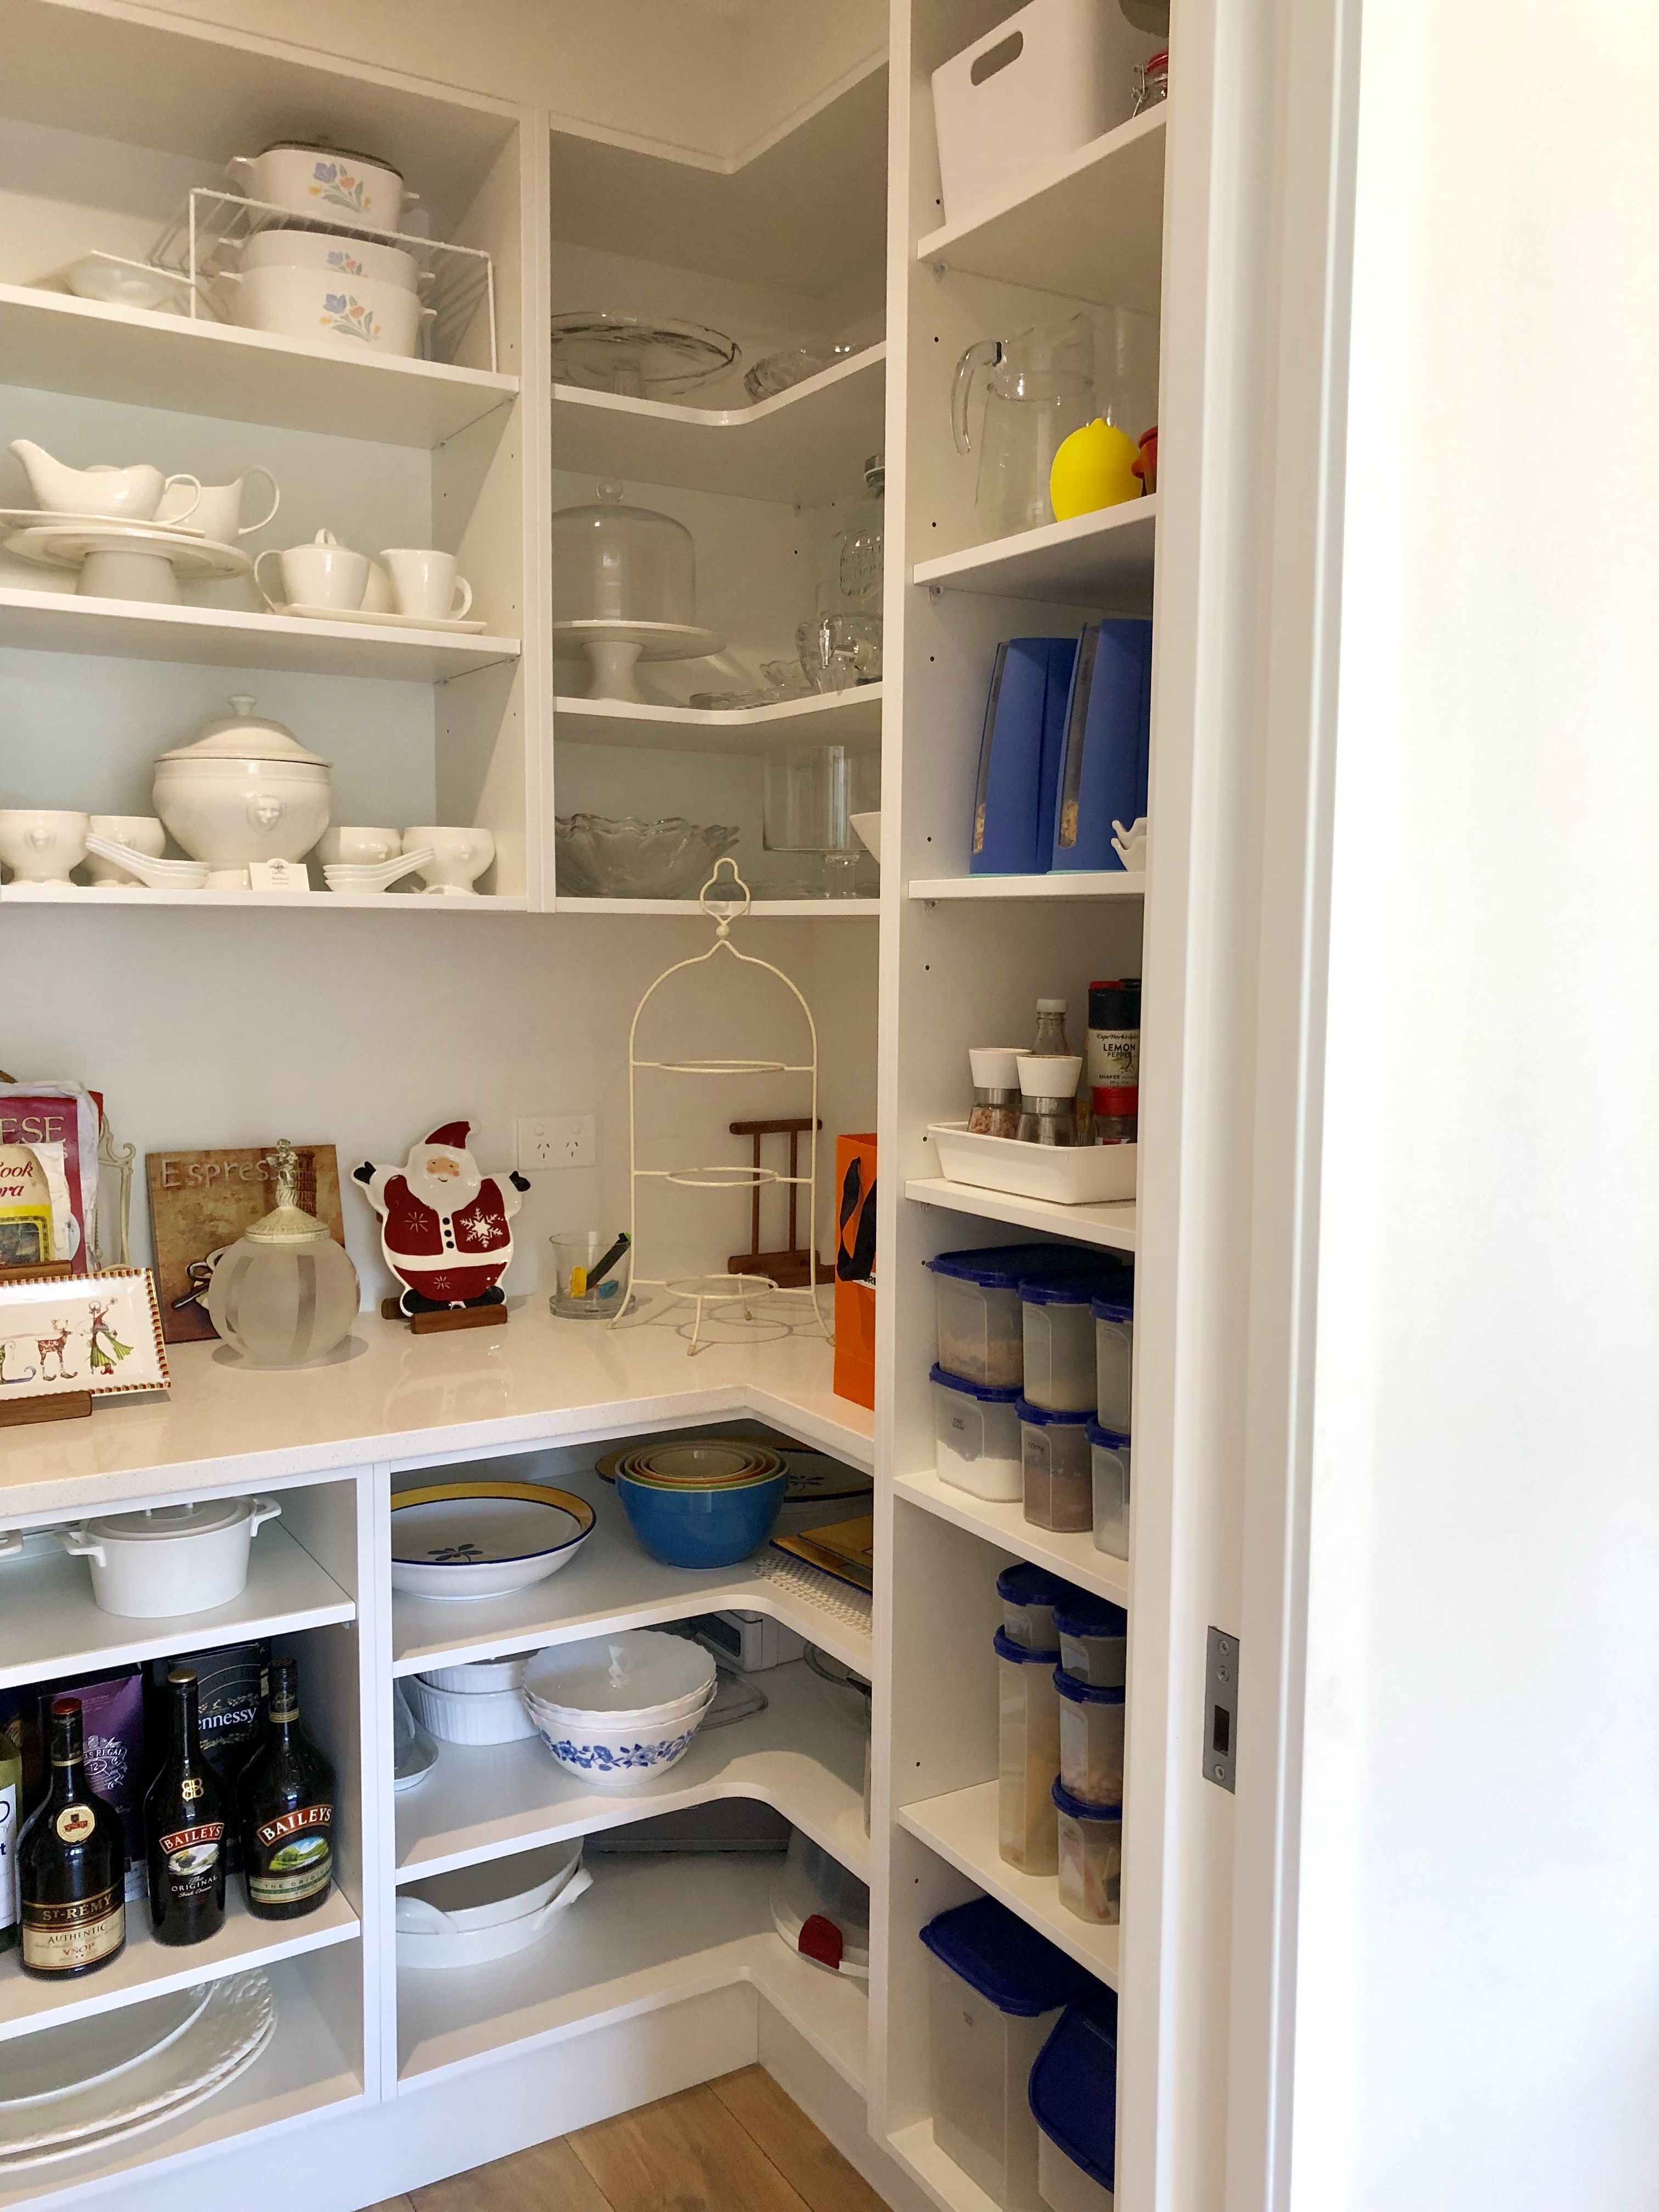 My New Walk In Pantry Pantry Shelving Pantry Design Kitchen Pantry Design